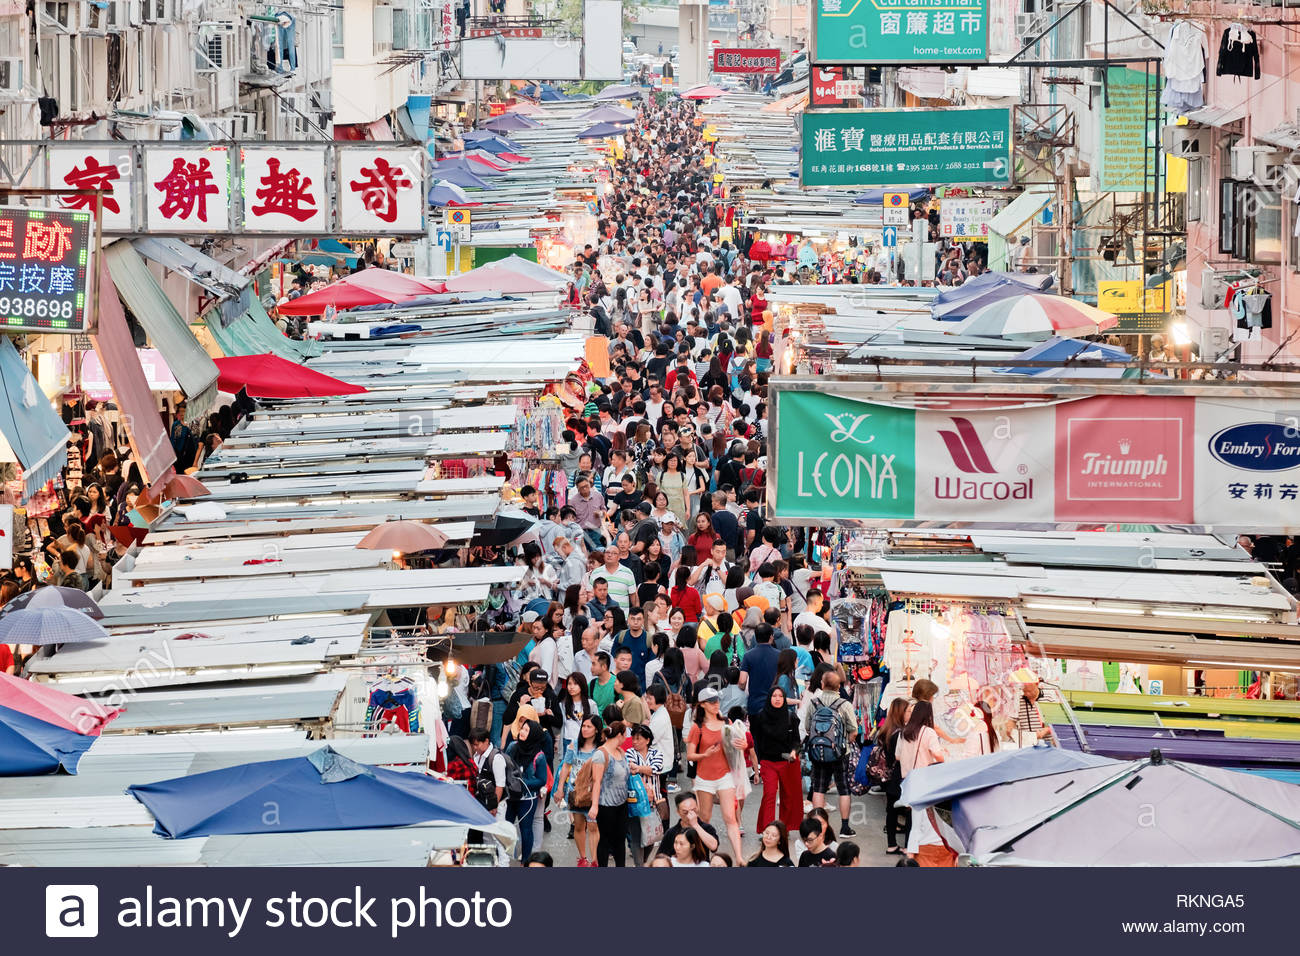 Mong Kok, Hong Kong - October 21, 2018 : People shopping at Fa Yuen Street Market. Fa Yuen Street is a retail street. - Stock Image